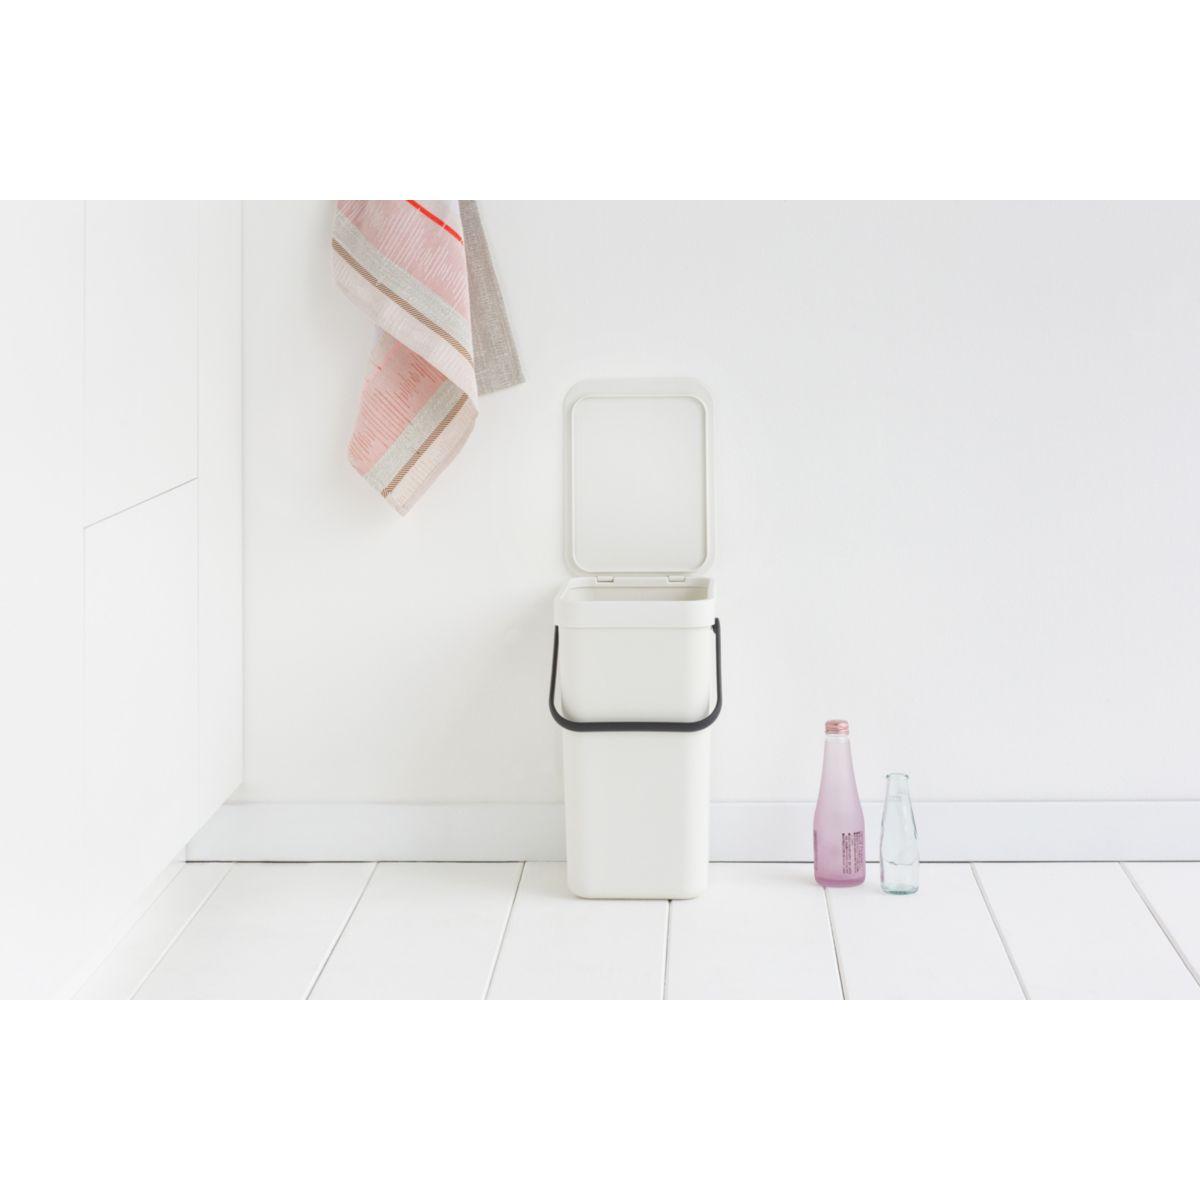 Poubelle manuelle BRABANTIA Waste Bin Sort & Go 12L White (photo)